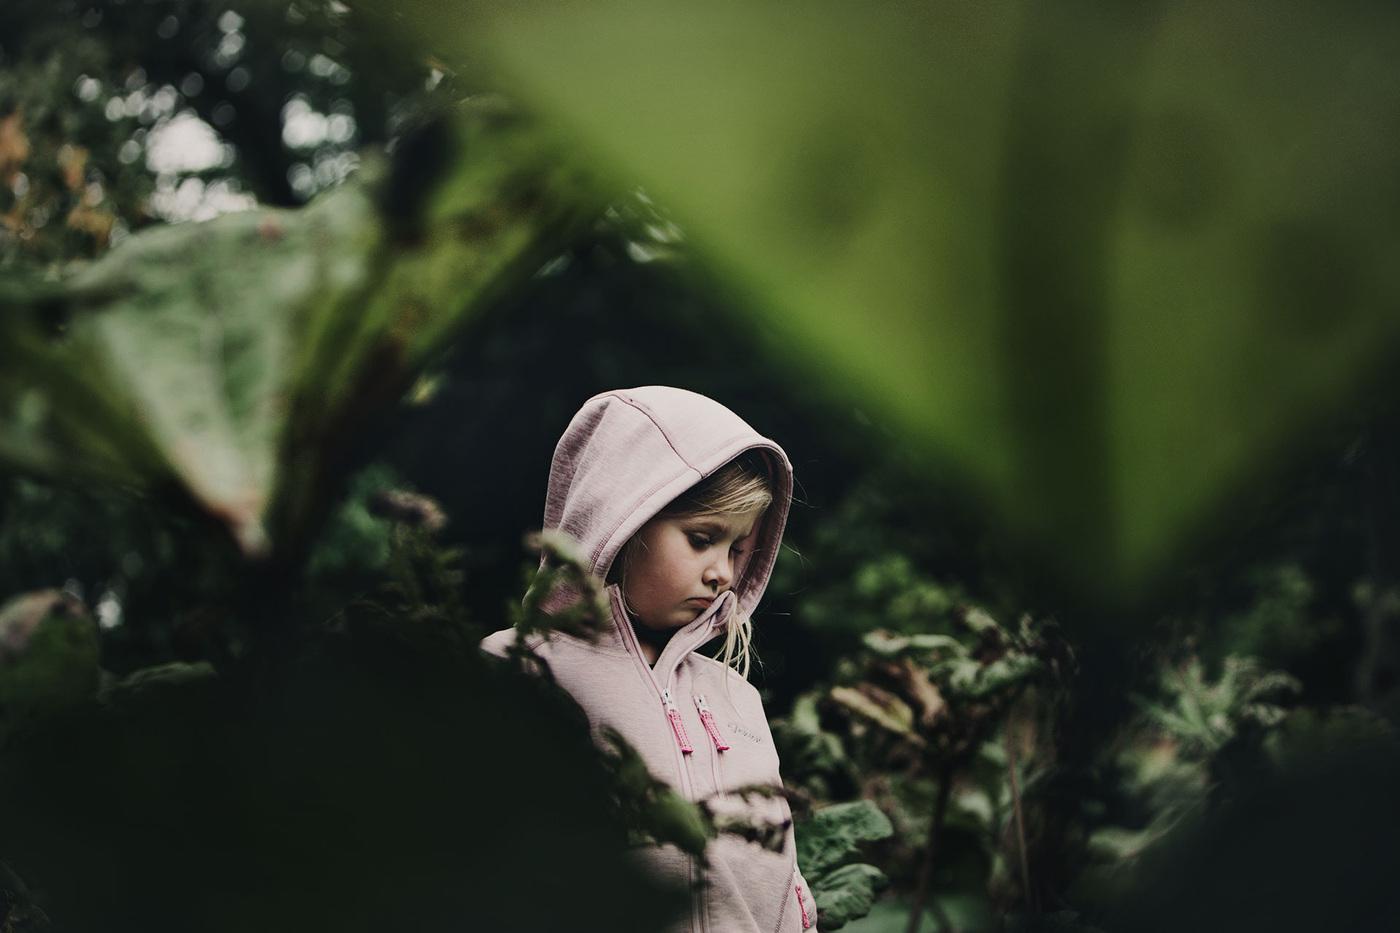 Helen Shippey - Fine art fotografering ute i skogen